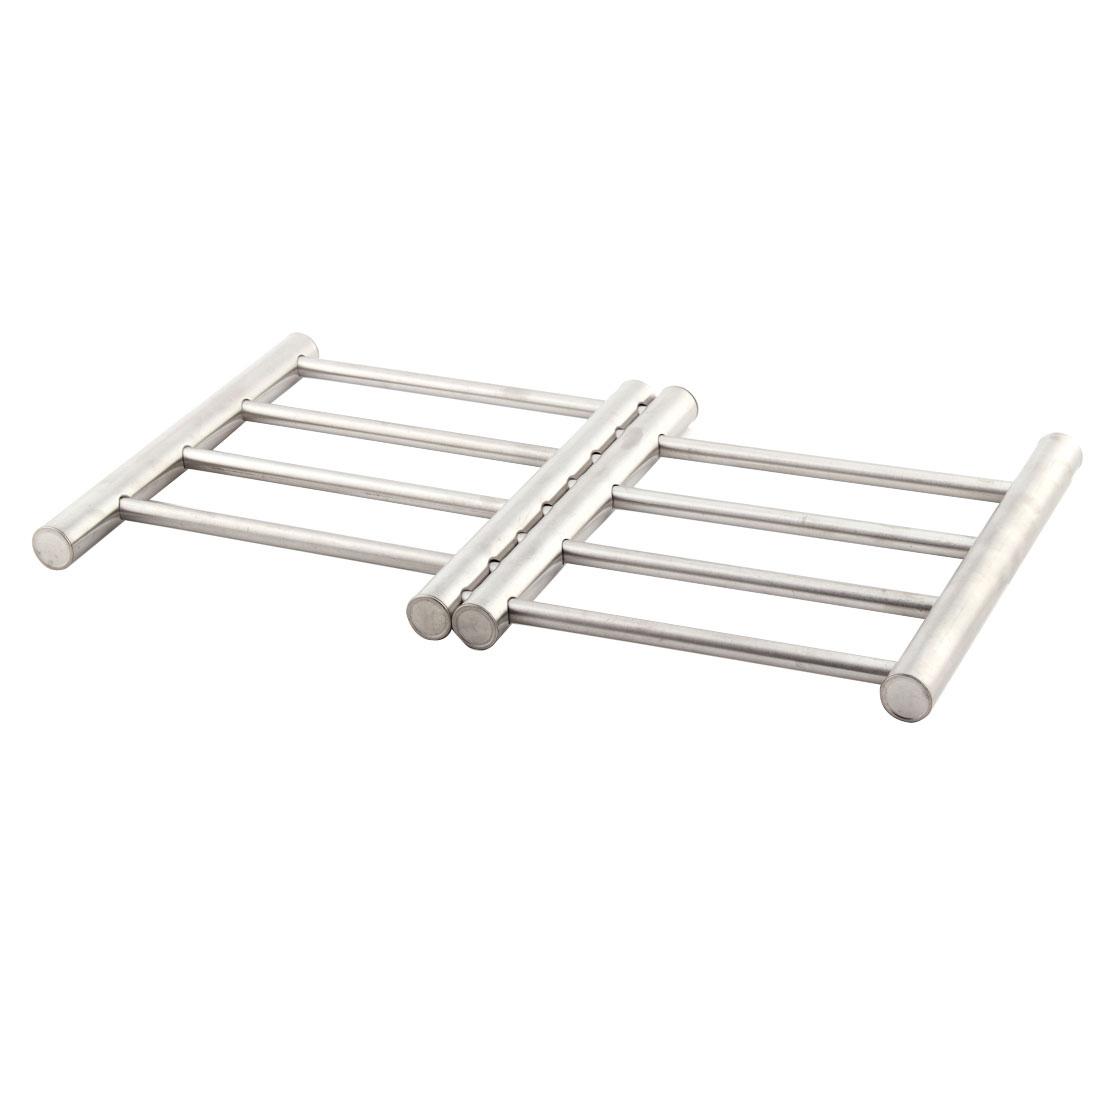 Kitchenware Stainless Steel Scalable Pot Pan Holder Heat Insulation Shelf Rack